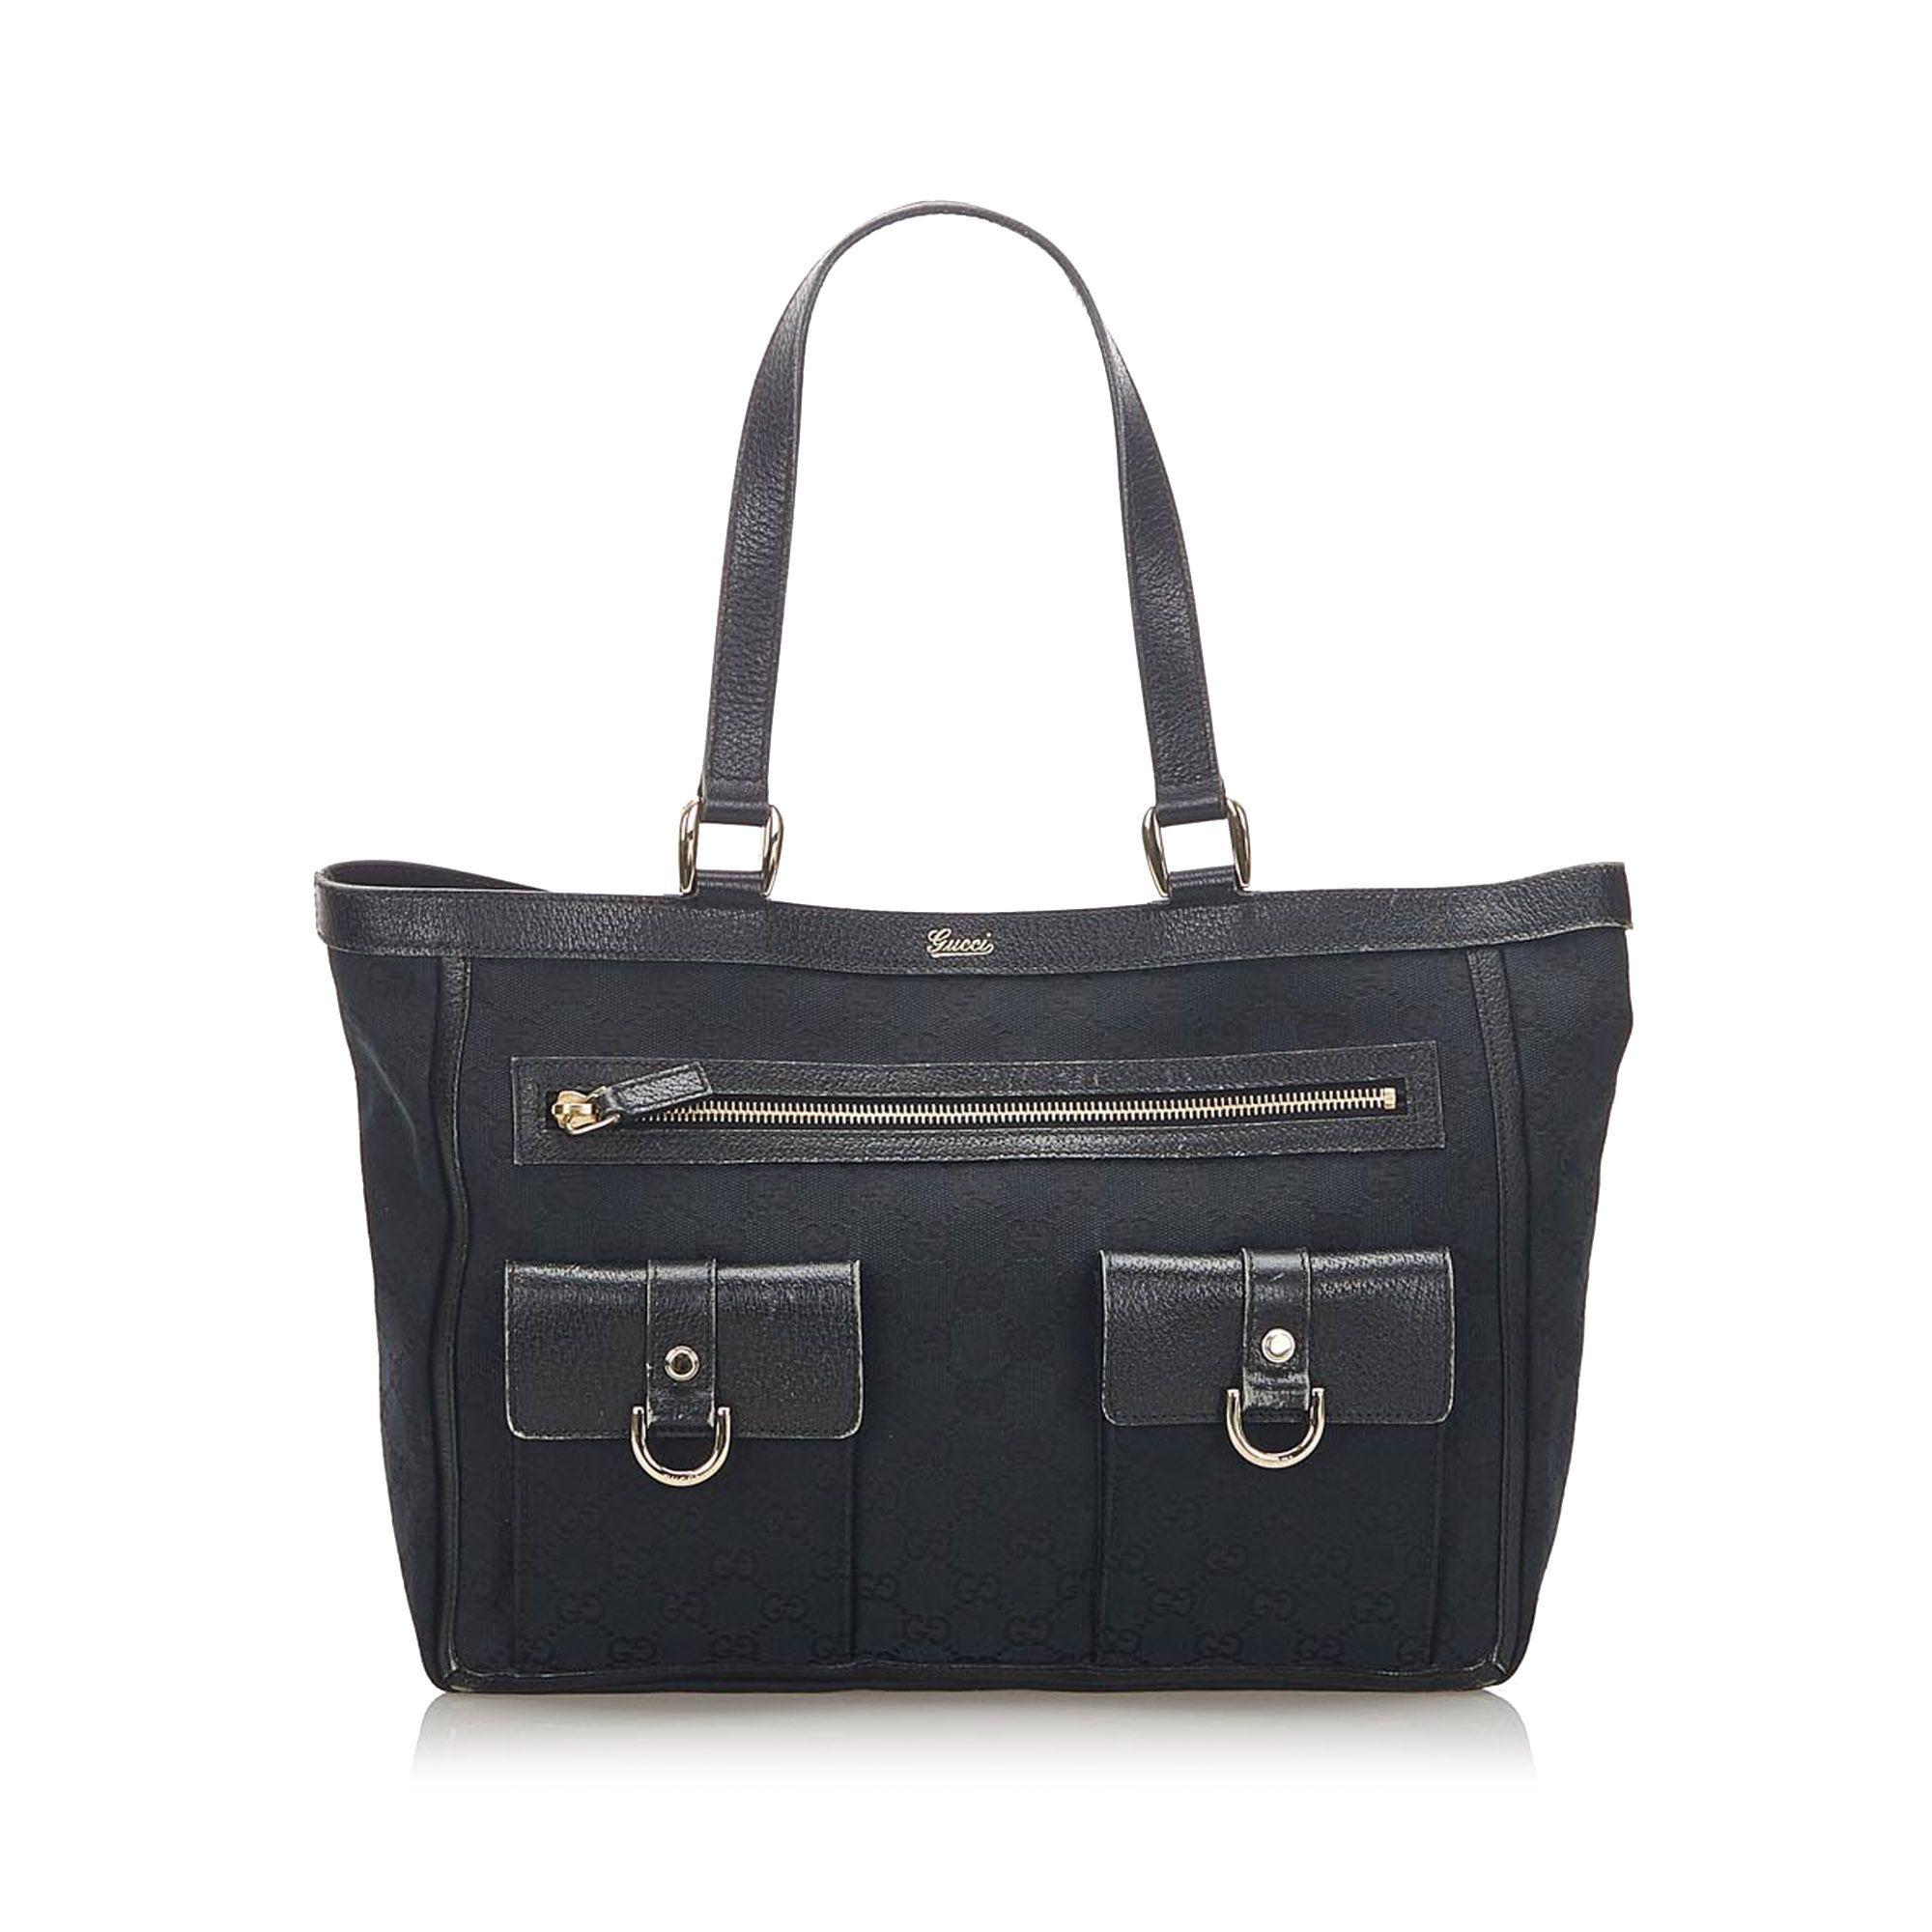 Vintage Gucci GG Canvas Abbey D Ring Shoulder Bag Black